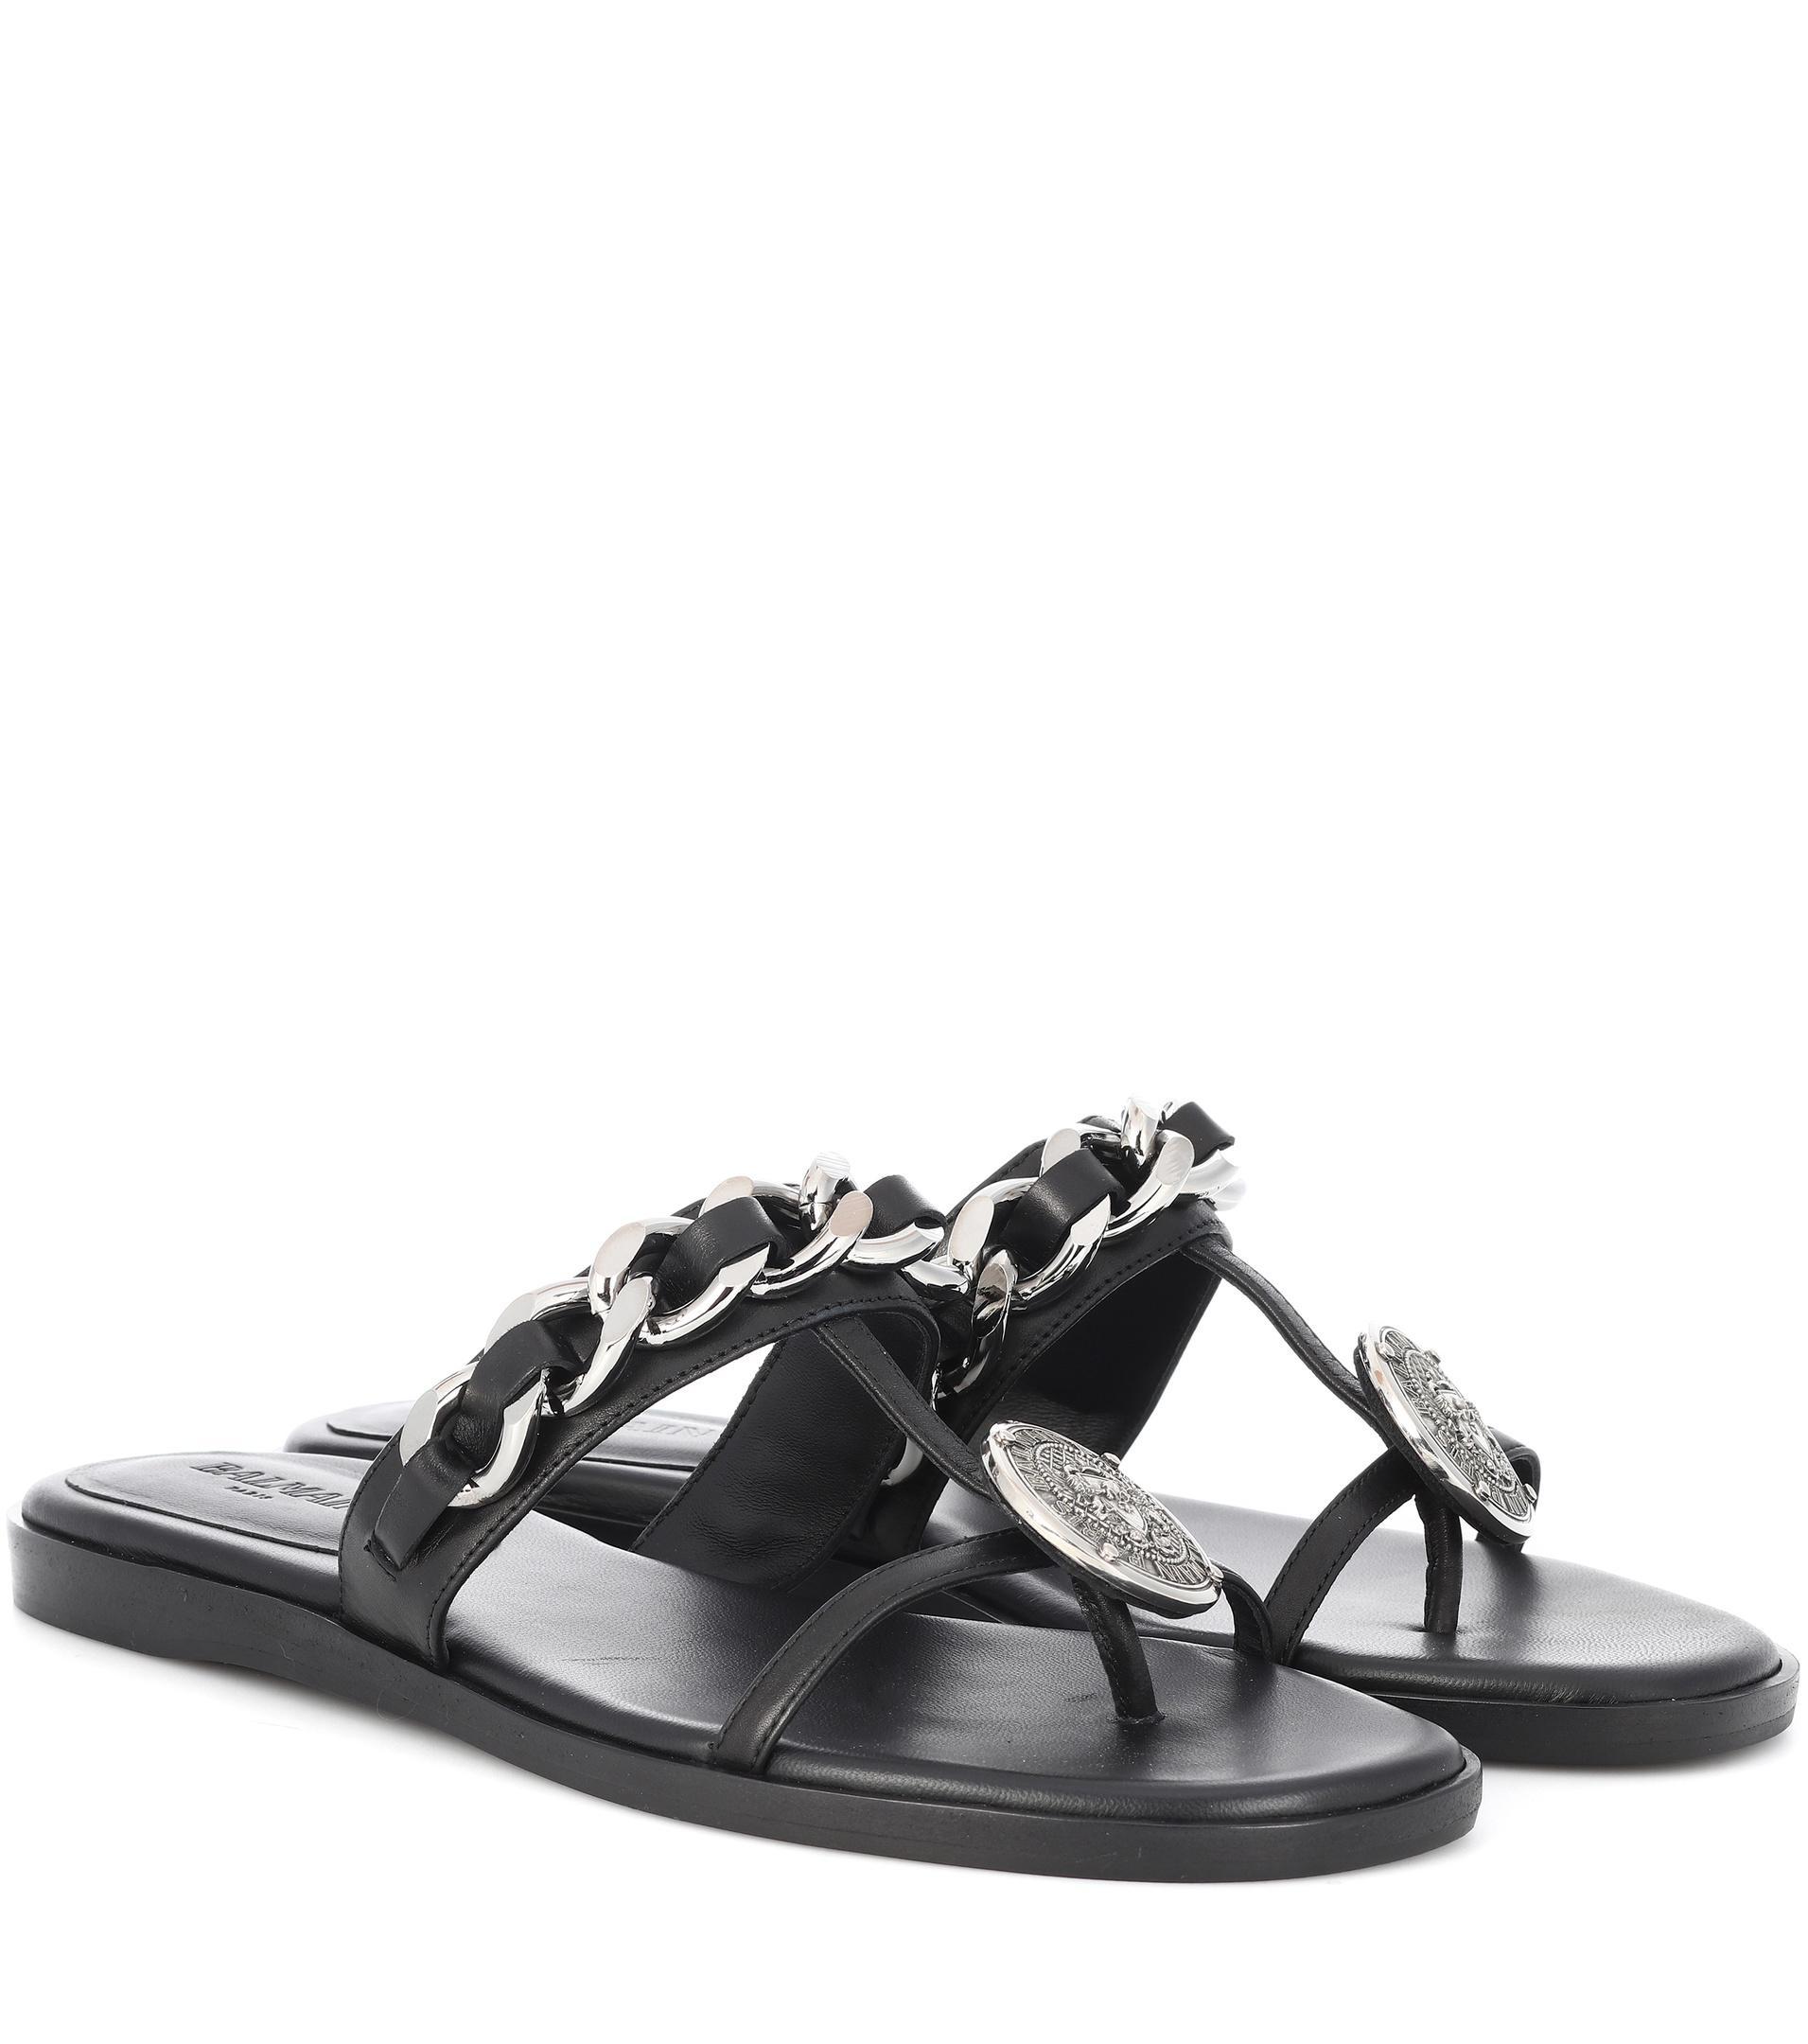 Embellished Leather Sandals - Black Balmain dnCXRpL9